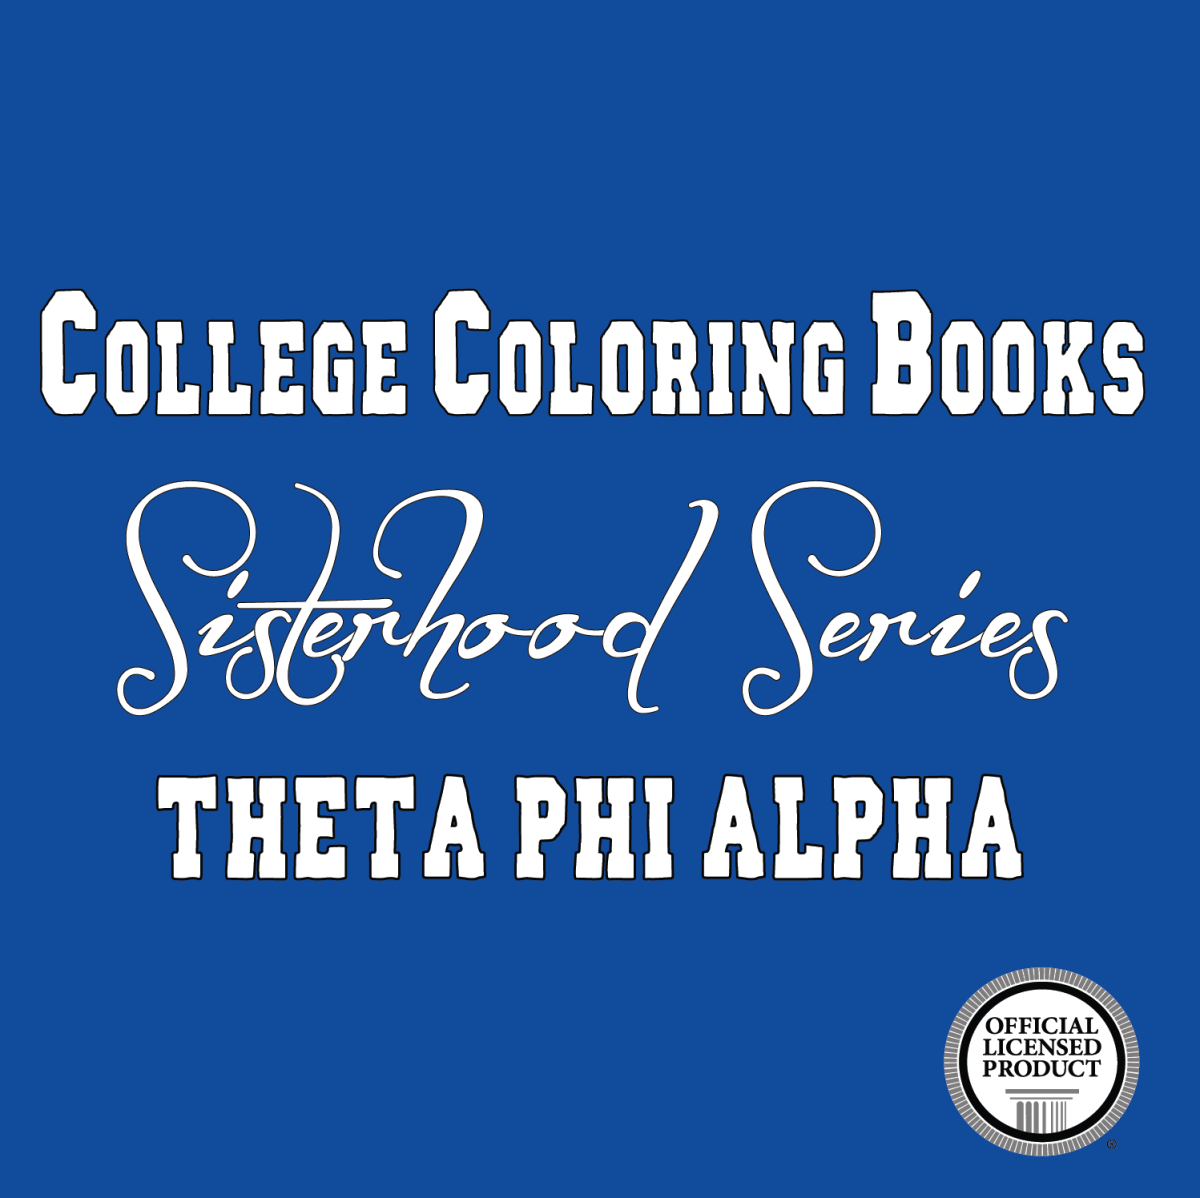 Theta Phi Alpha Adult Coloring Book